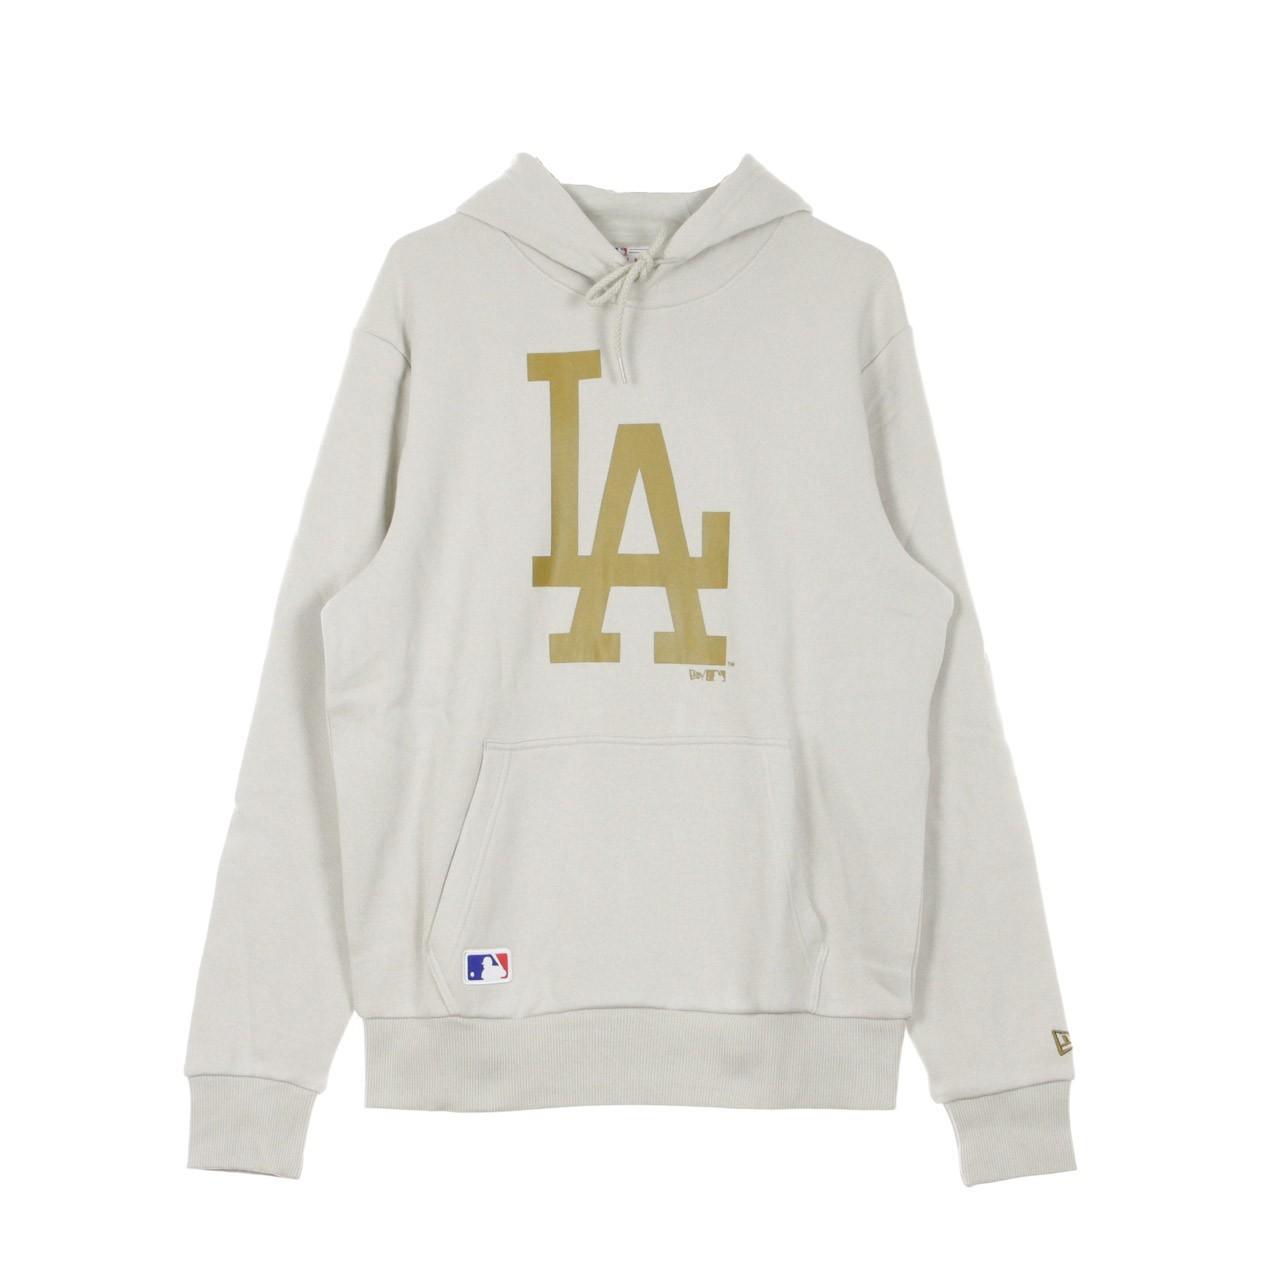 NEW ERA MLB SEASONAL TEAM LOGO HOODY LOSDOD 12033509